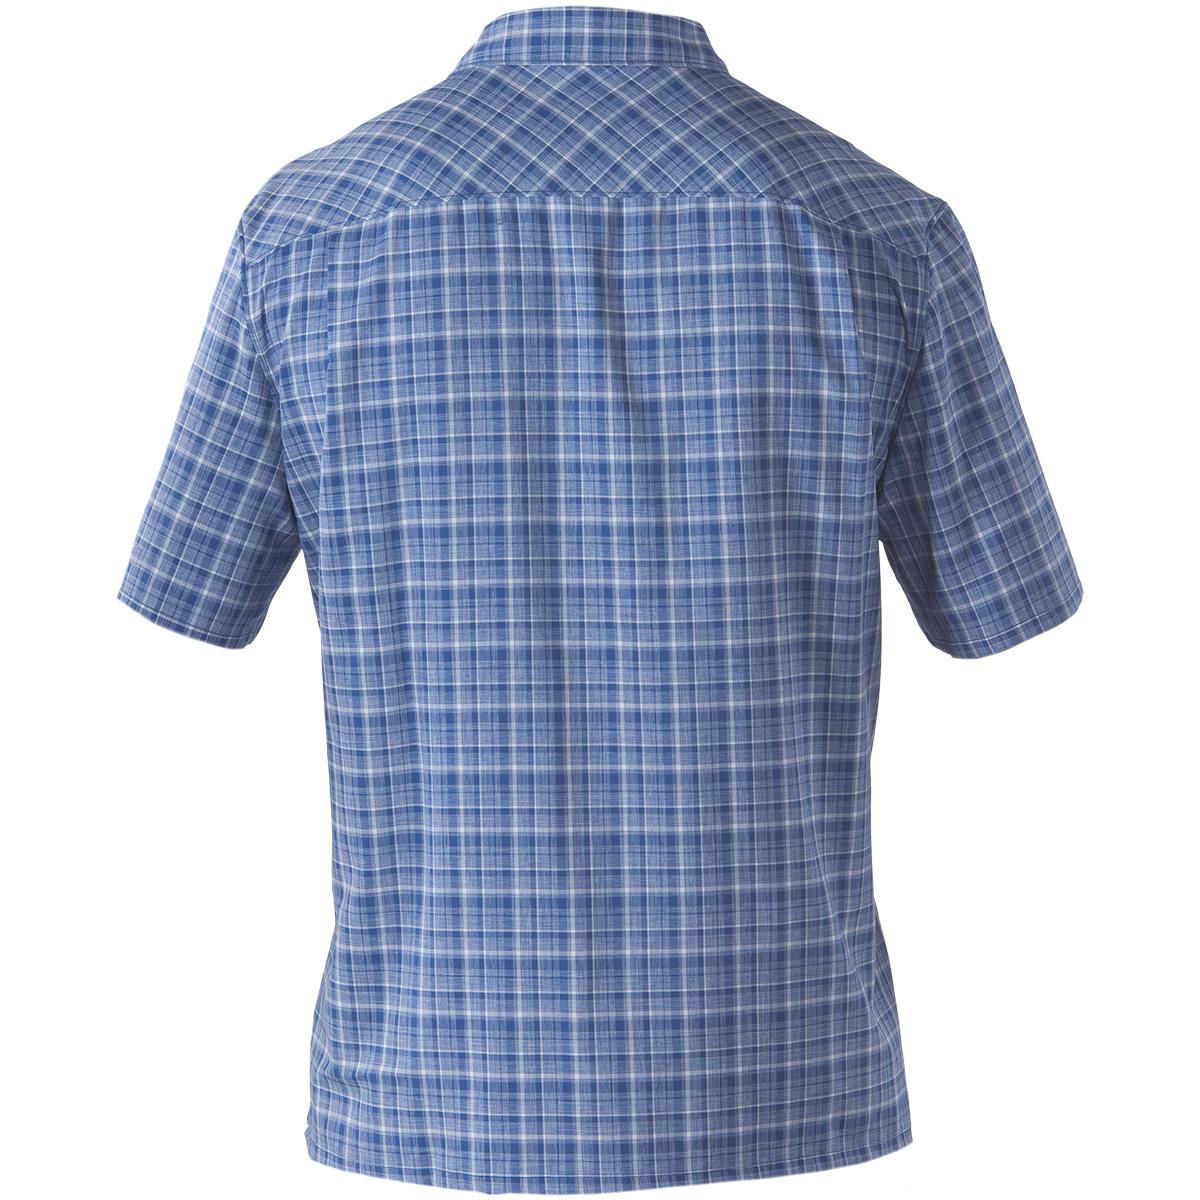 5.11 Covert Performance Mens Short Sleeve Shirt Concealed ...